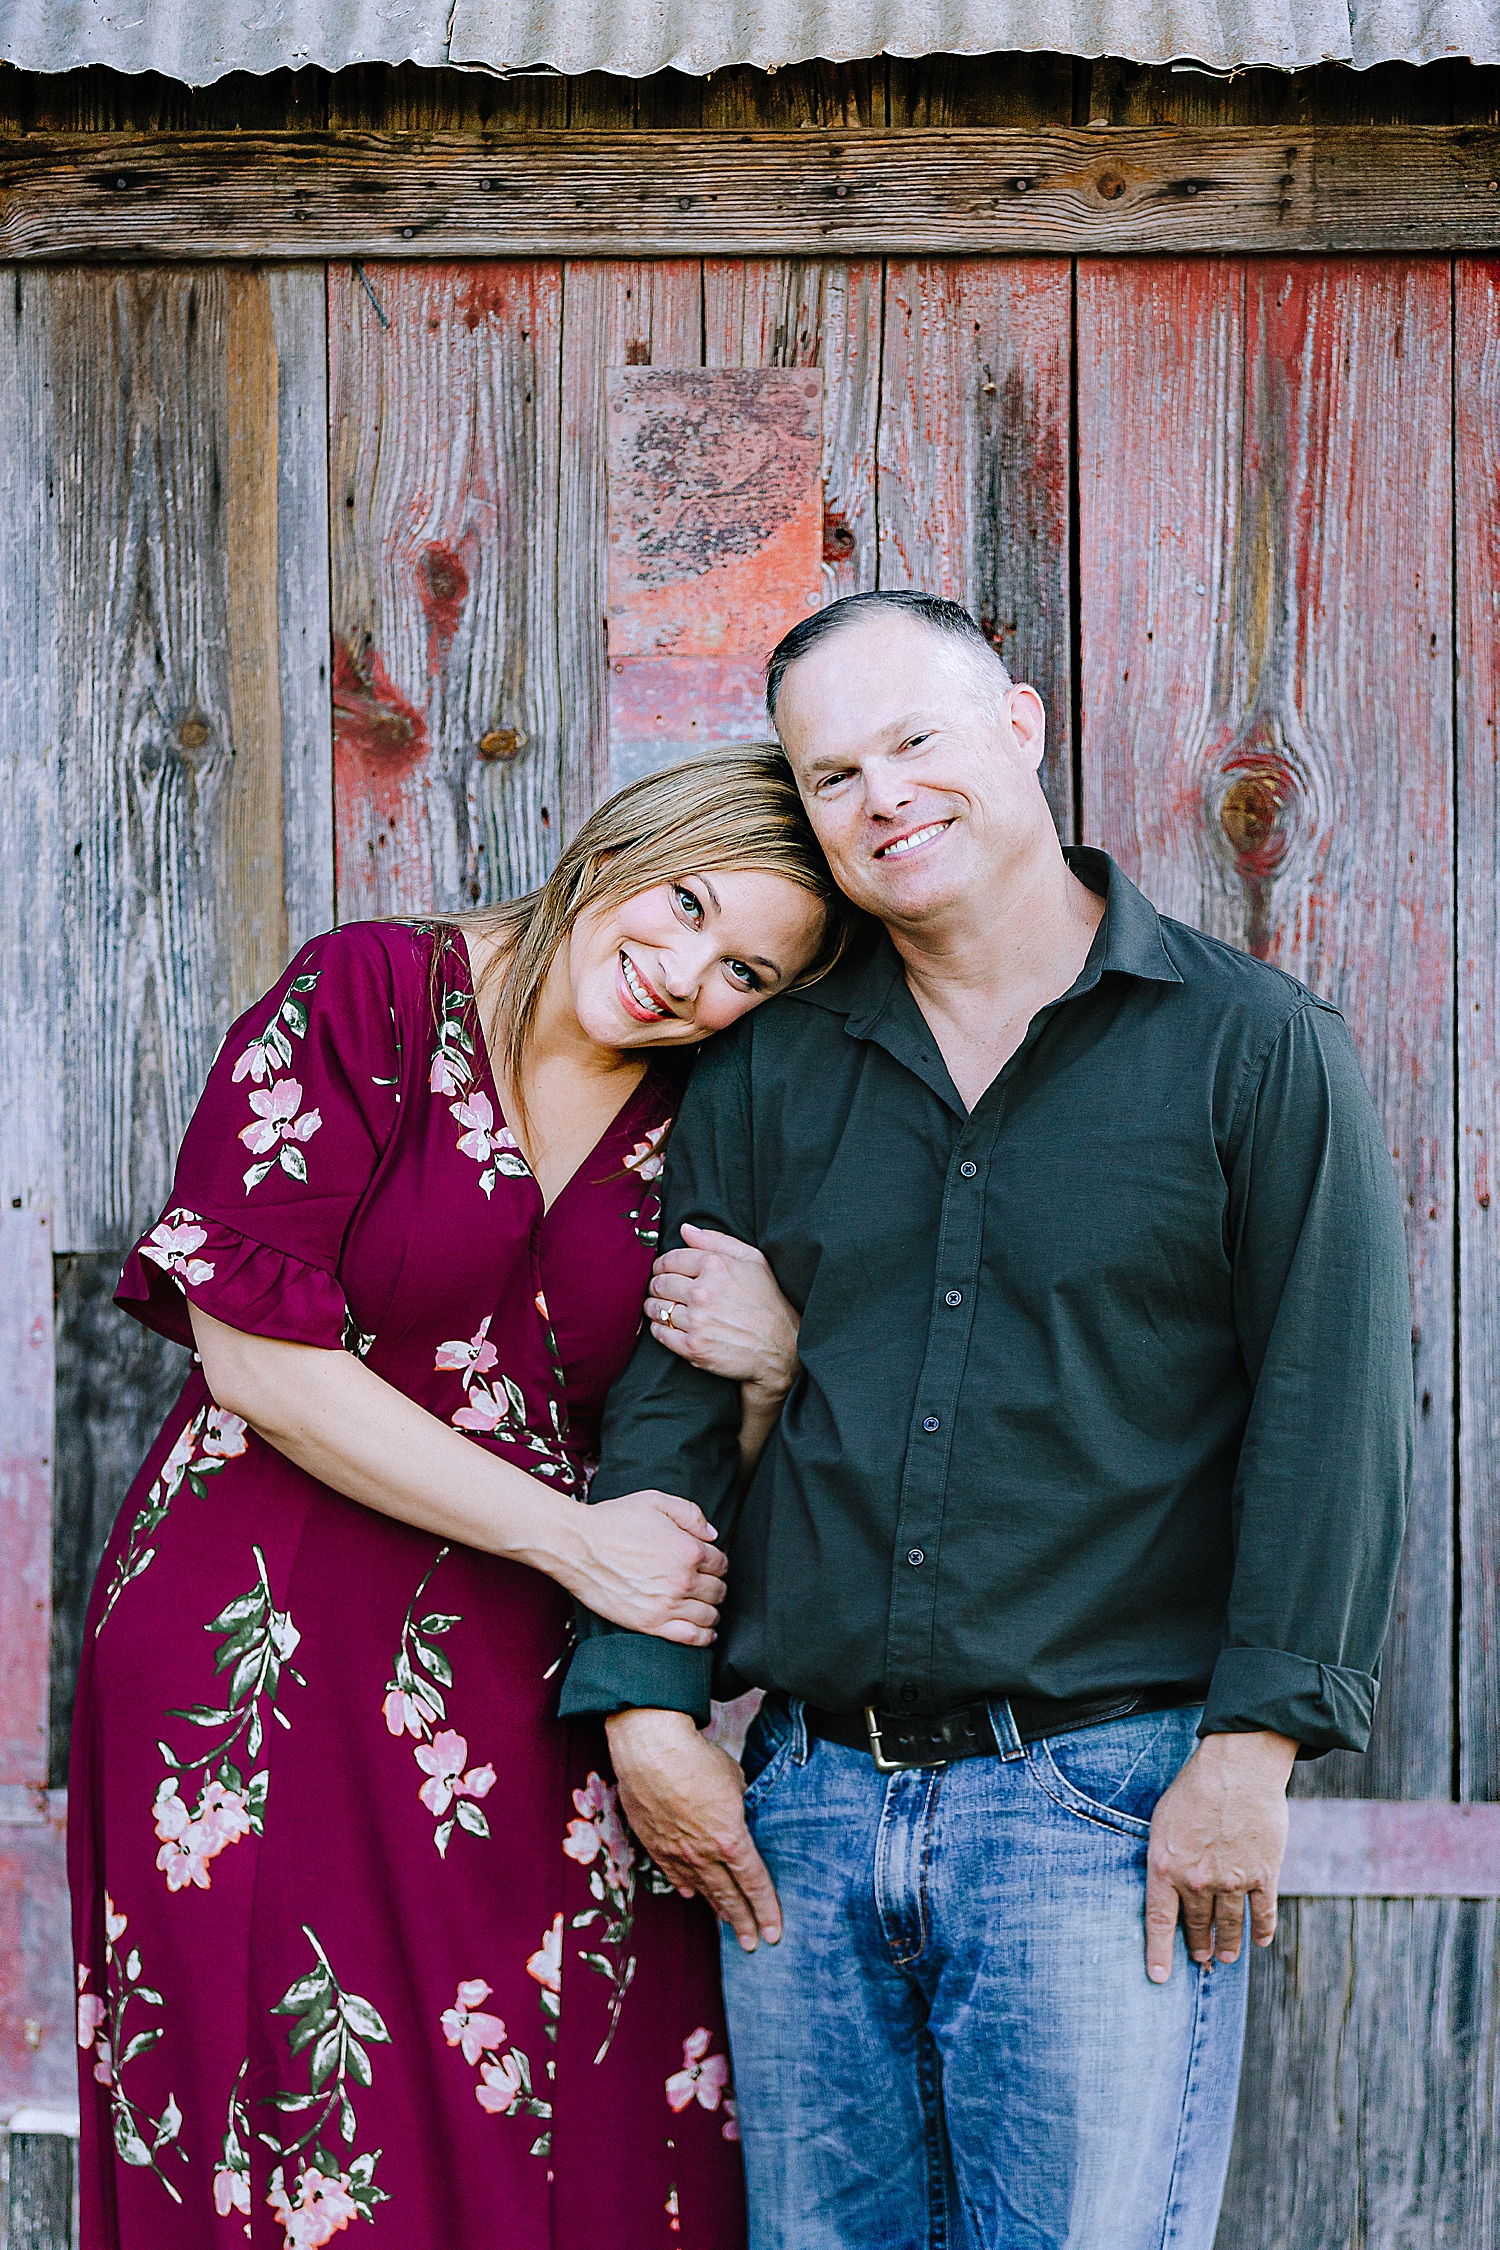 Carly-Barton-Photography-La-Vernia-Texas-Engagement-Photos-Sunset_0040.jpg